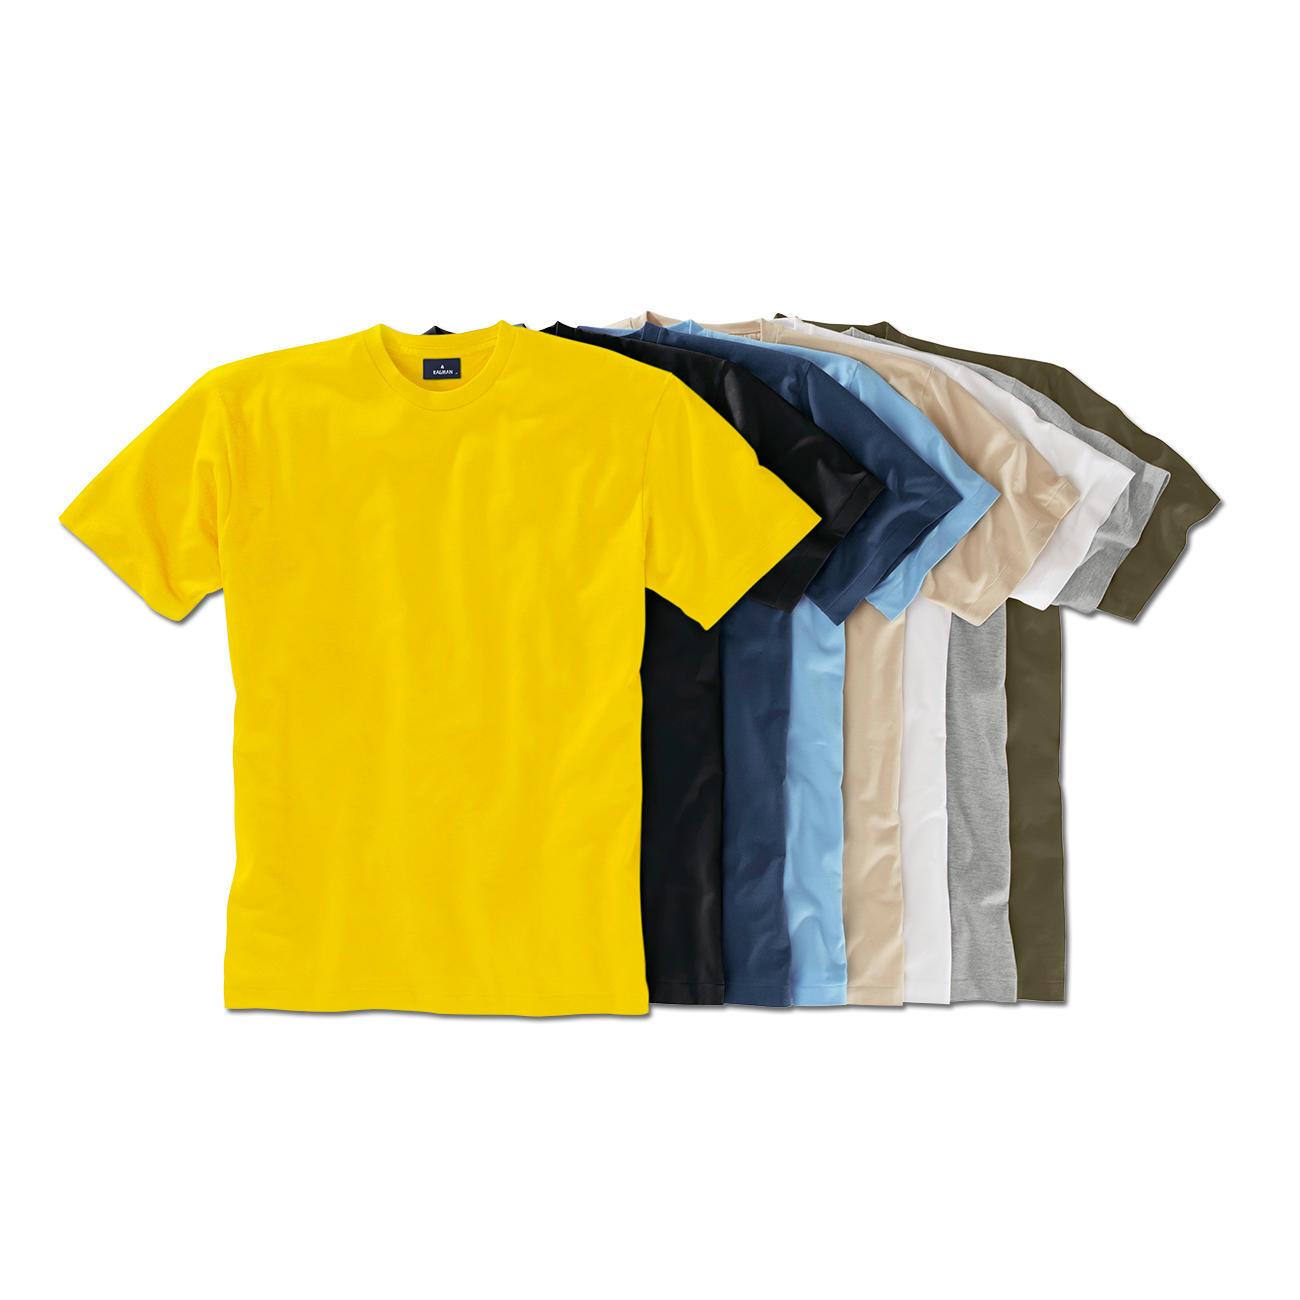 9786e886d254d6 Das 155 g-Ragman T-Shirt - Ihr wichtigstes T-Shirt  Südamerikanische